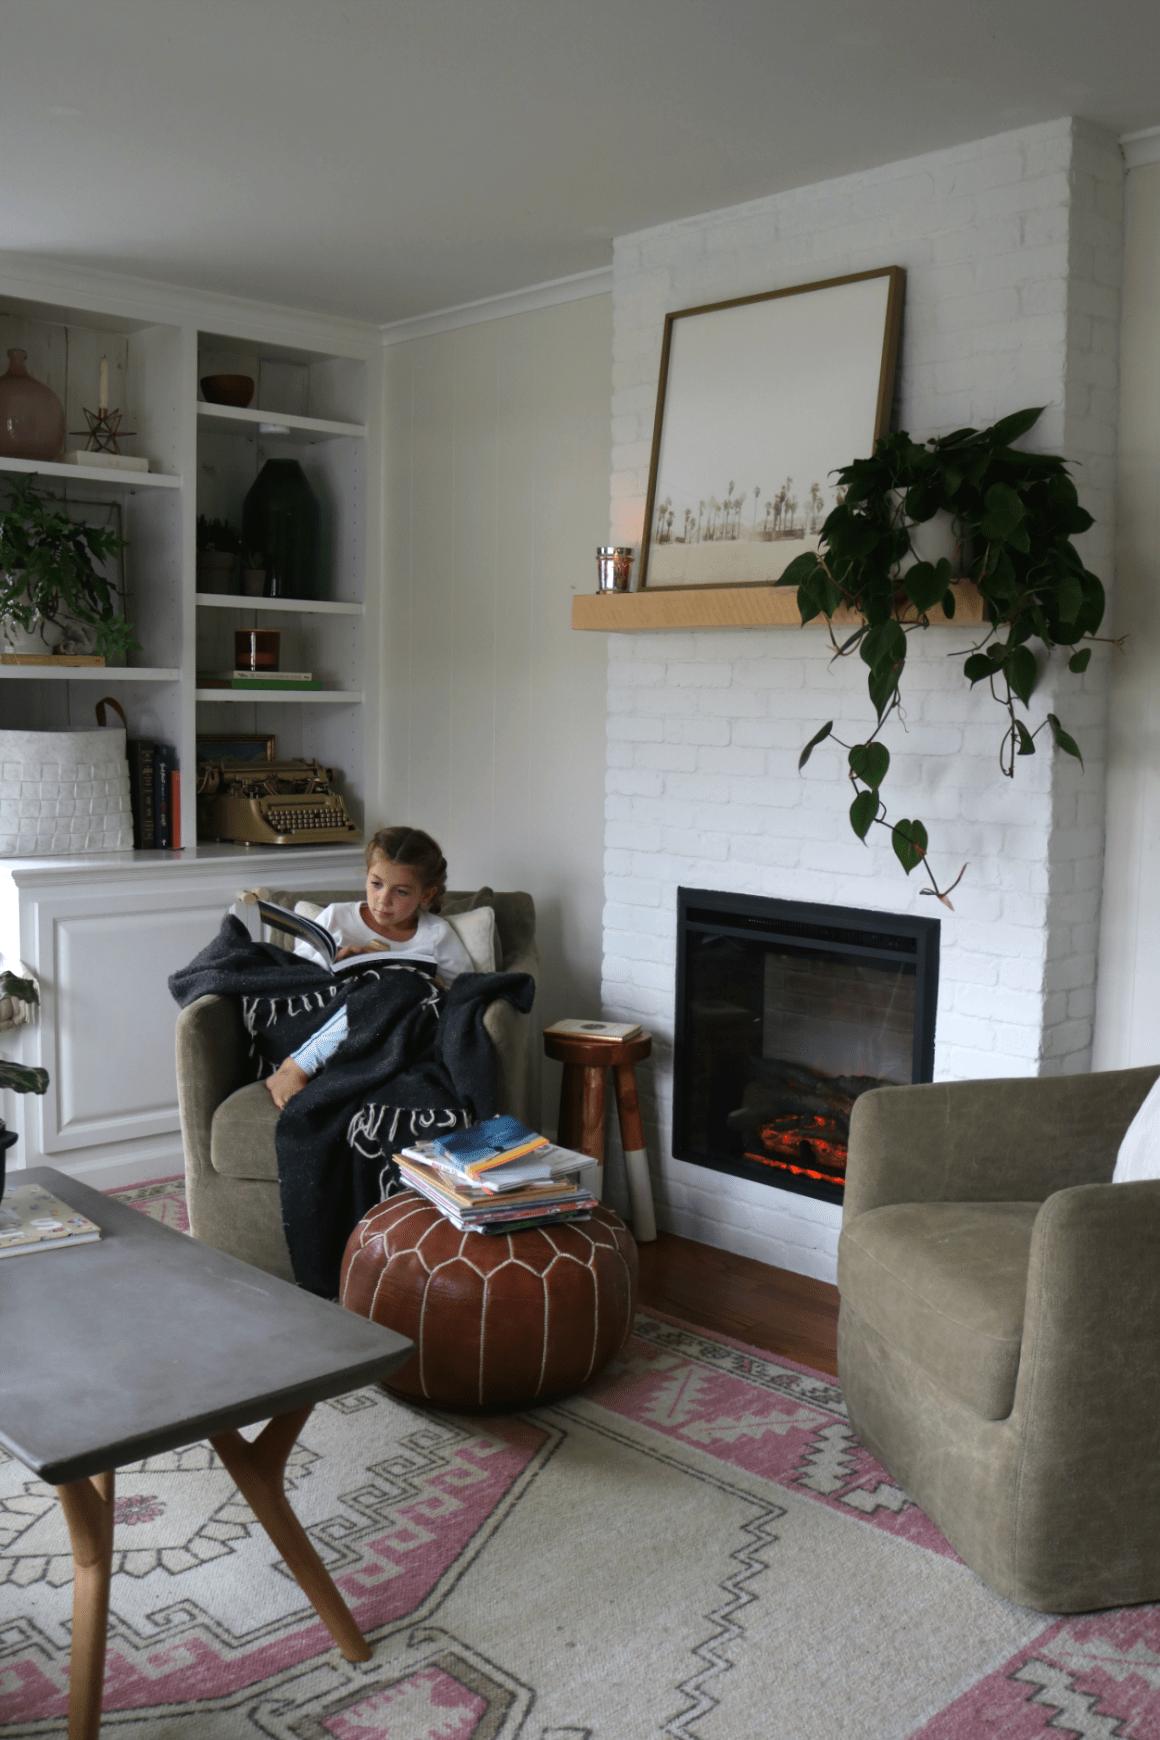 Fireplace Reveal- Our Electric Brick Fireplace #whitebrickfireplace